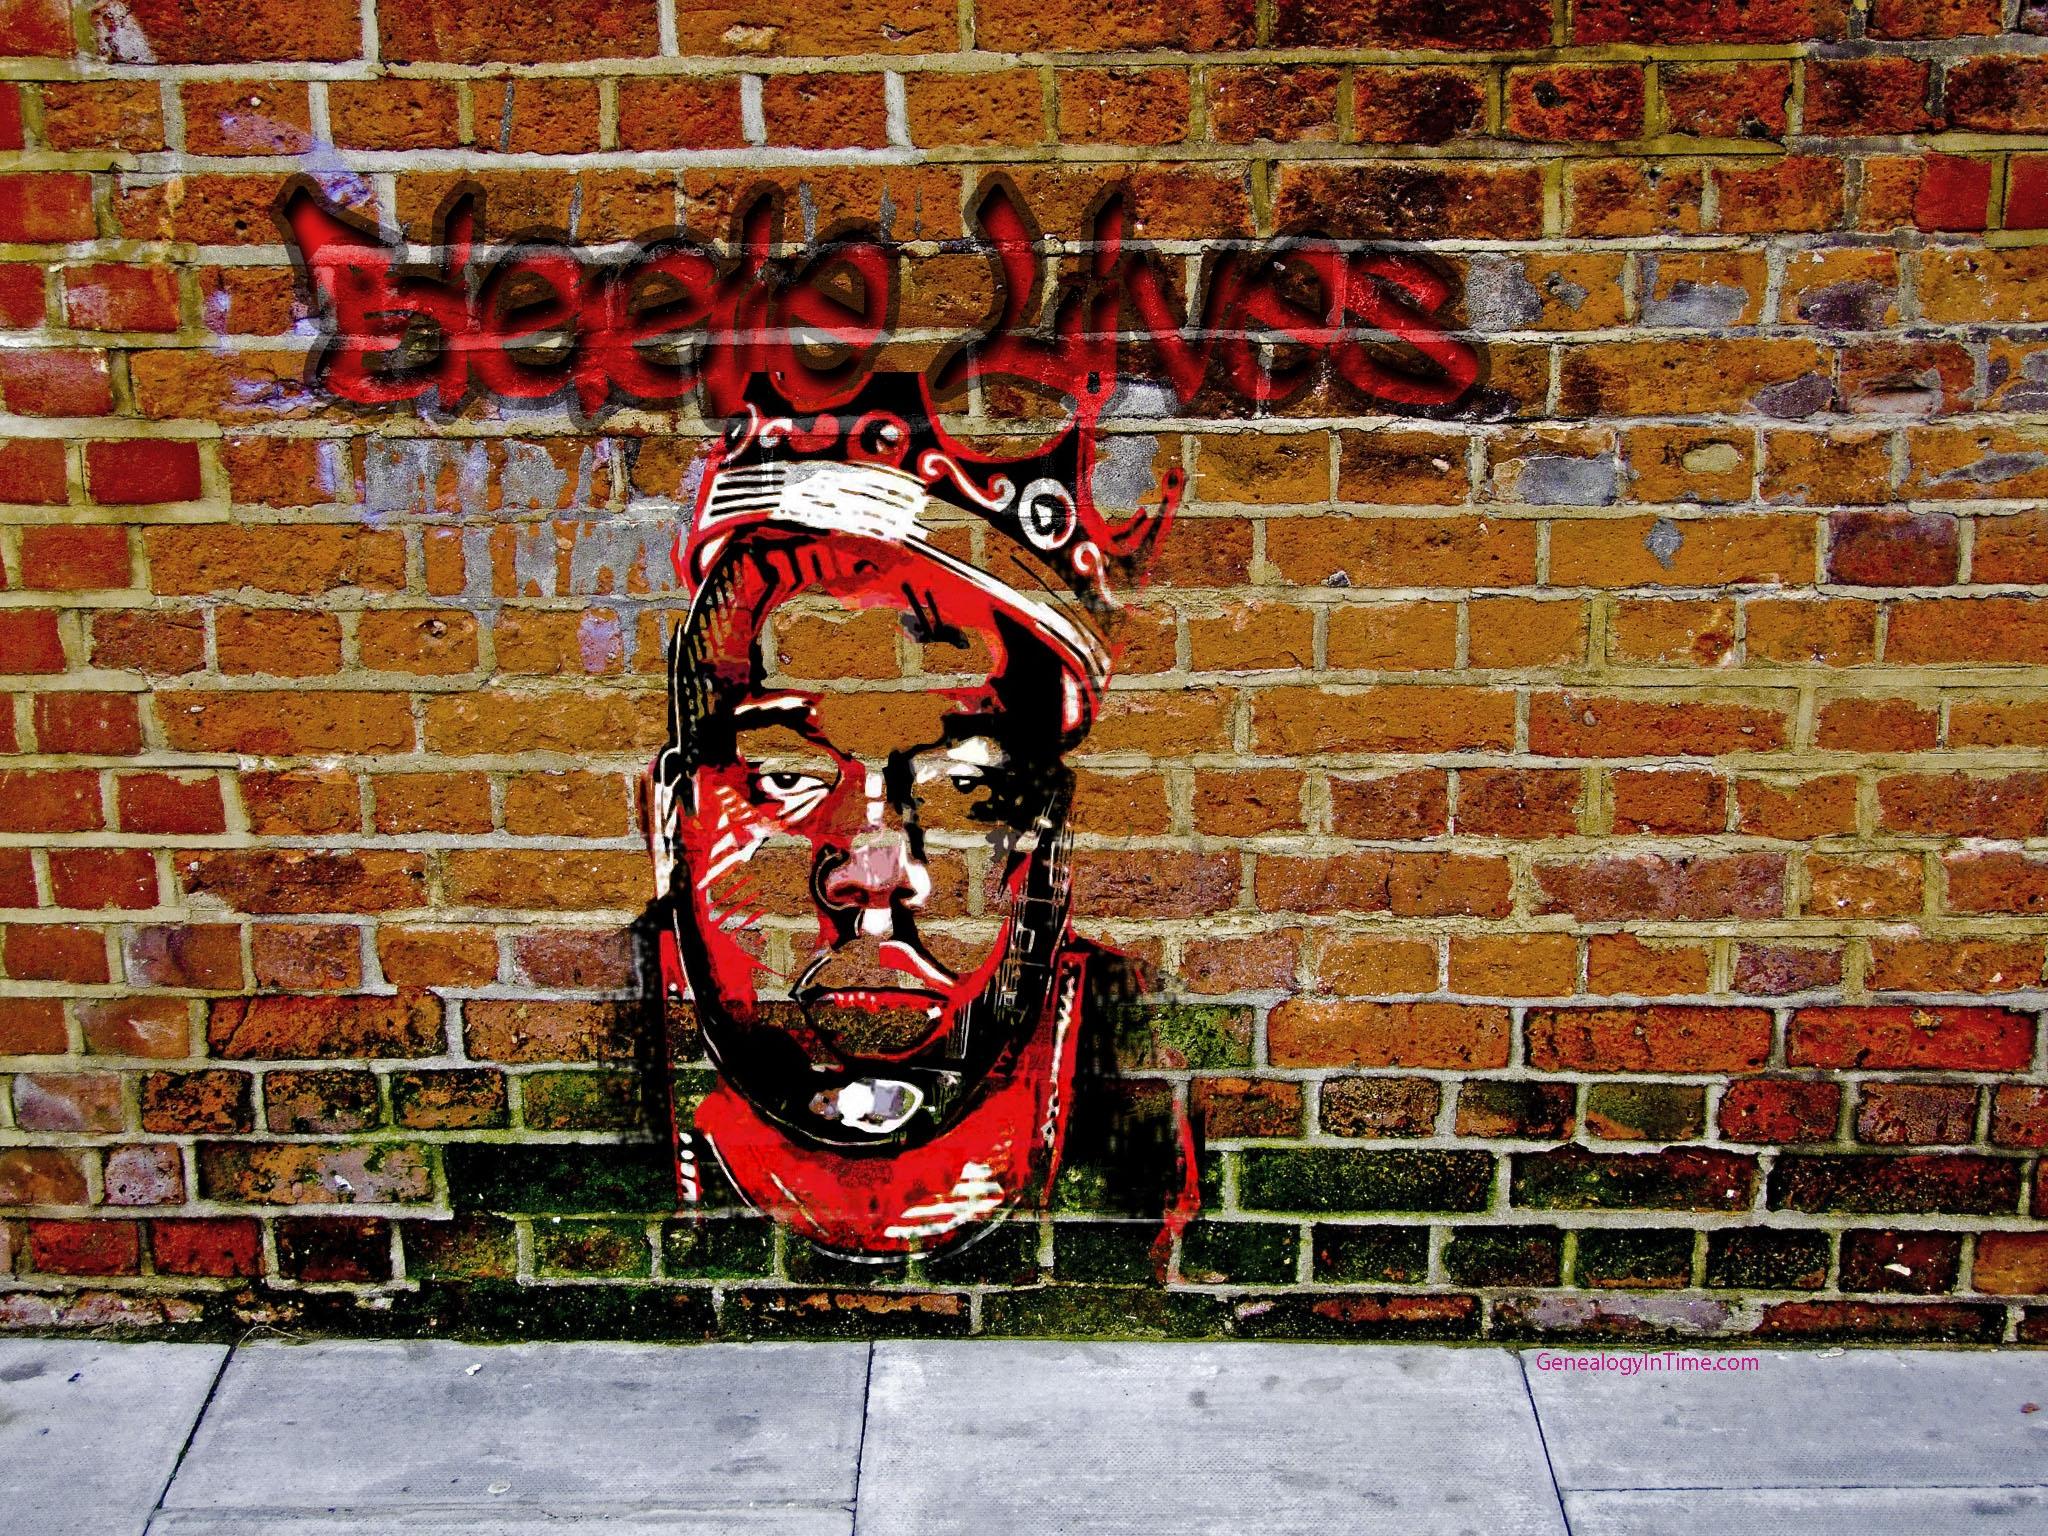 2048x1536 Graffiti Brick Wall Background Drawing Home Design Graffiti